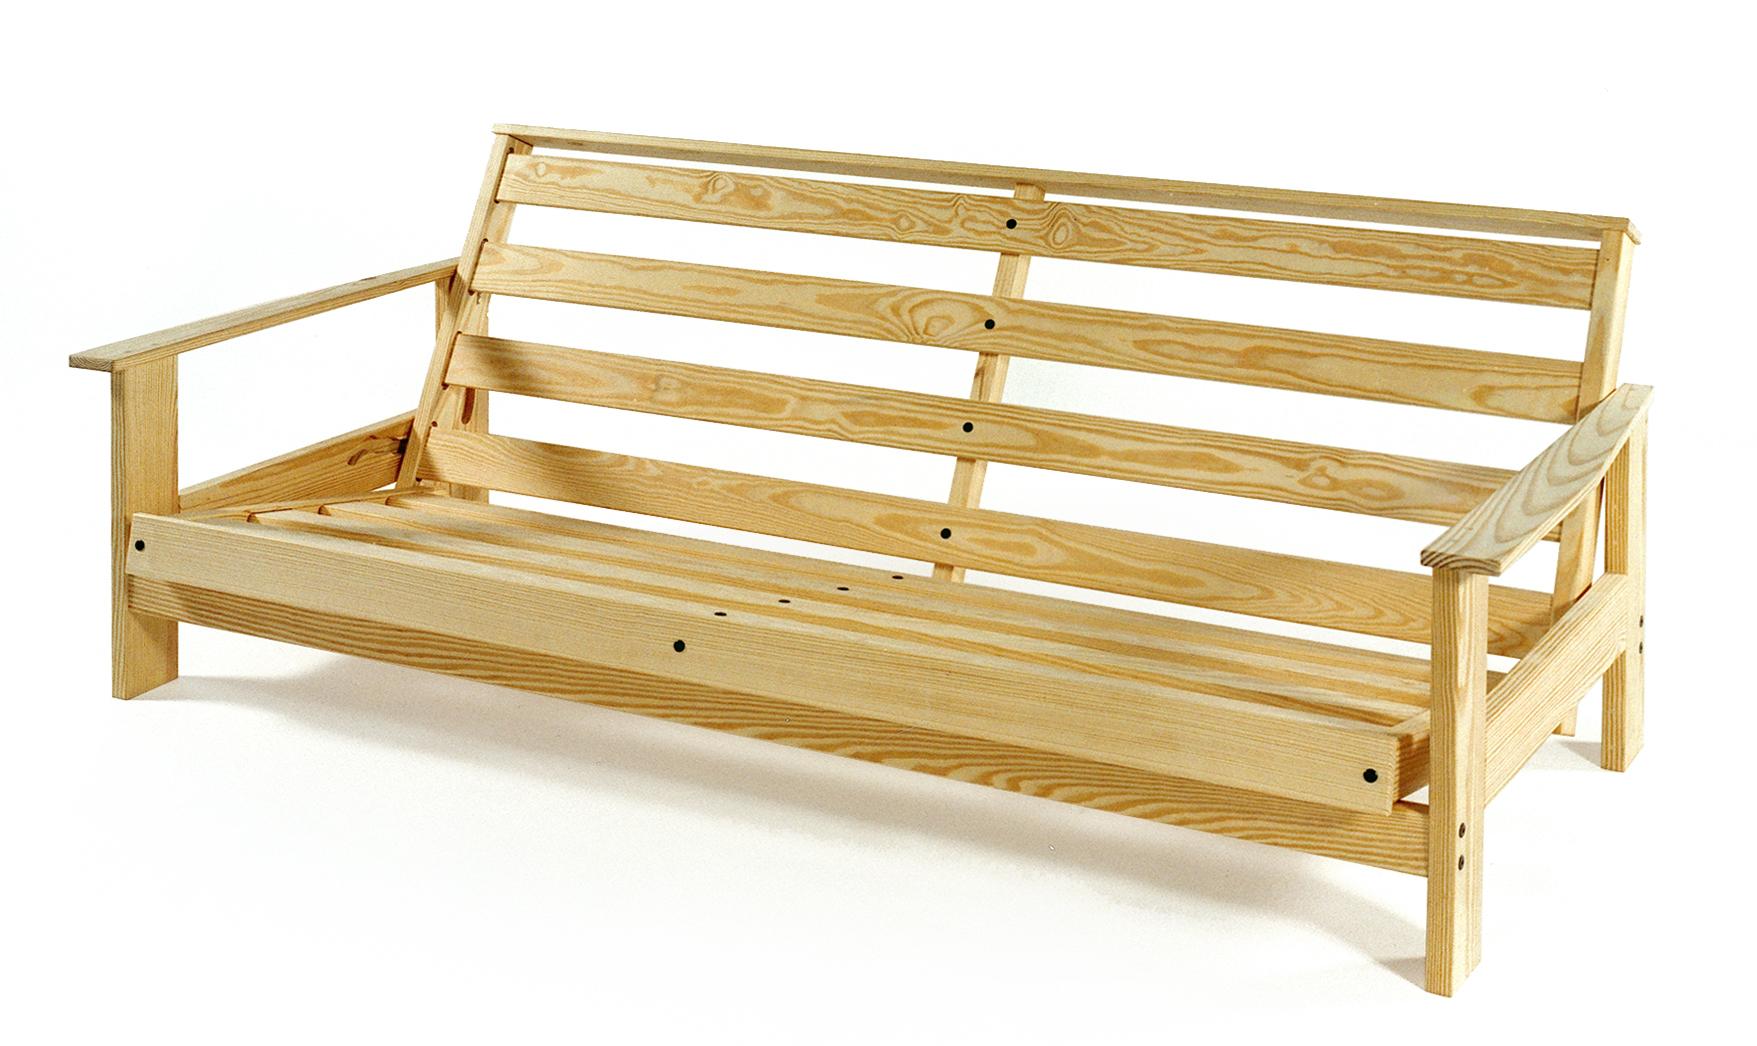 Sofa bed frame for Sofa bed frame